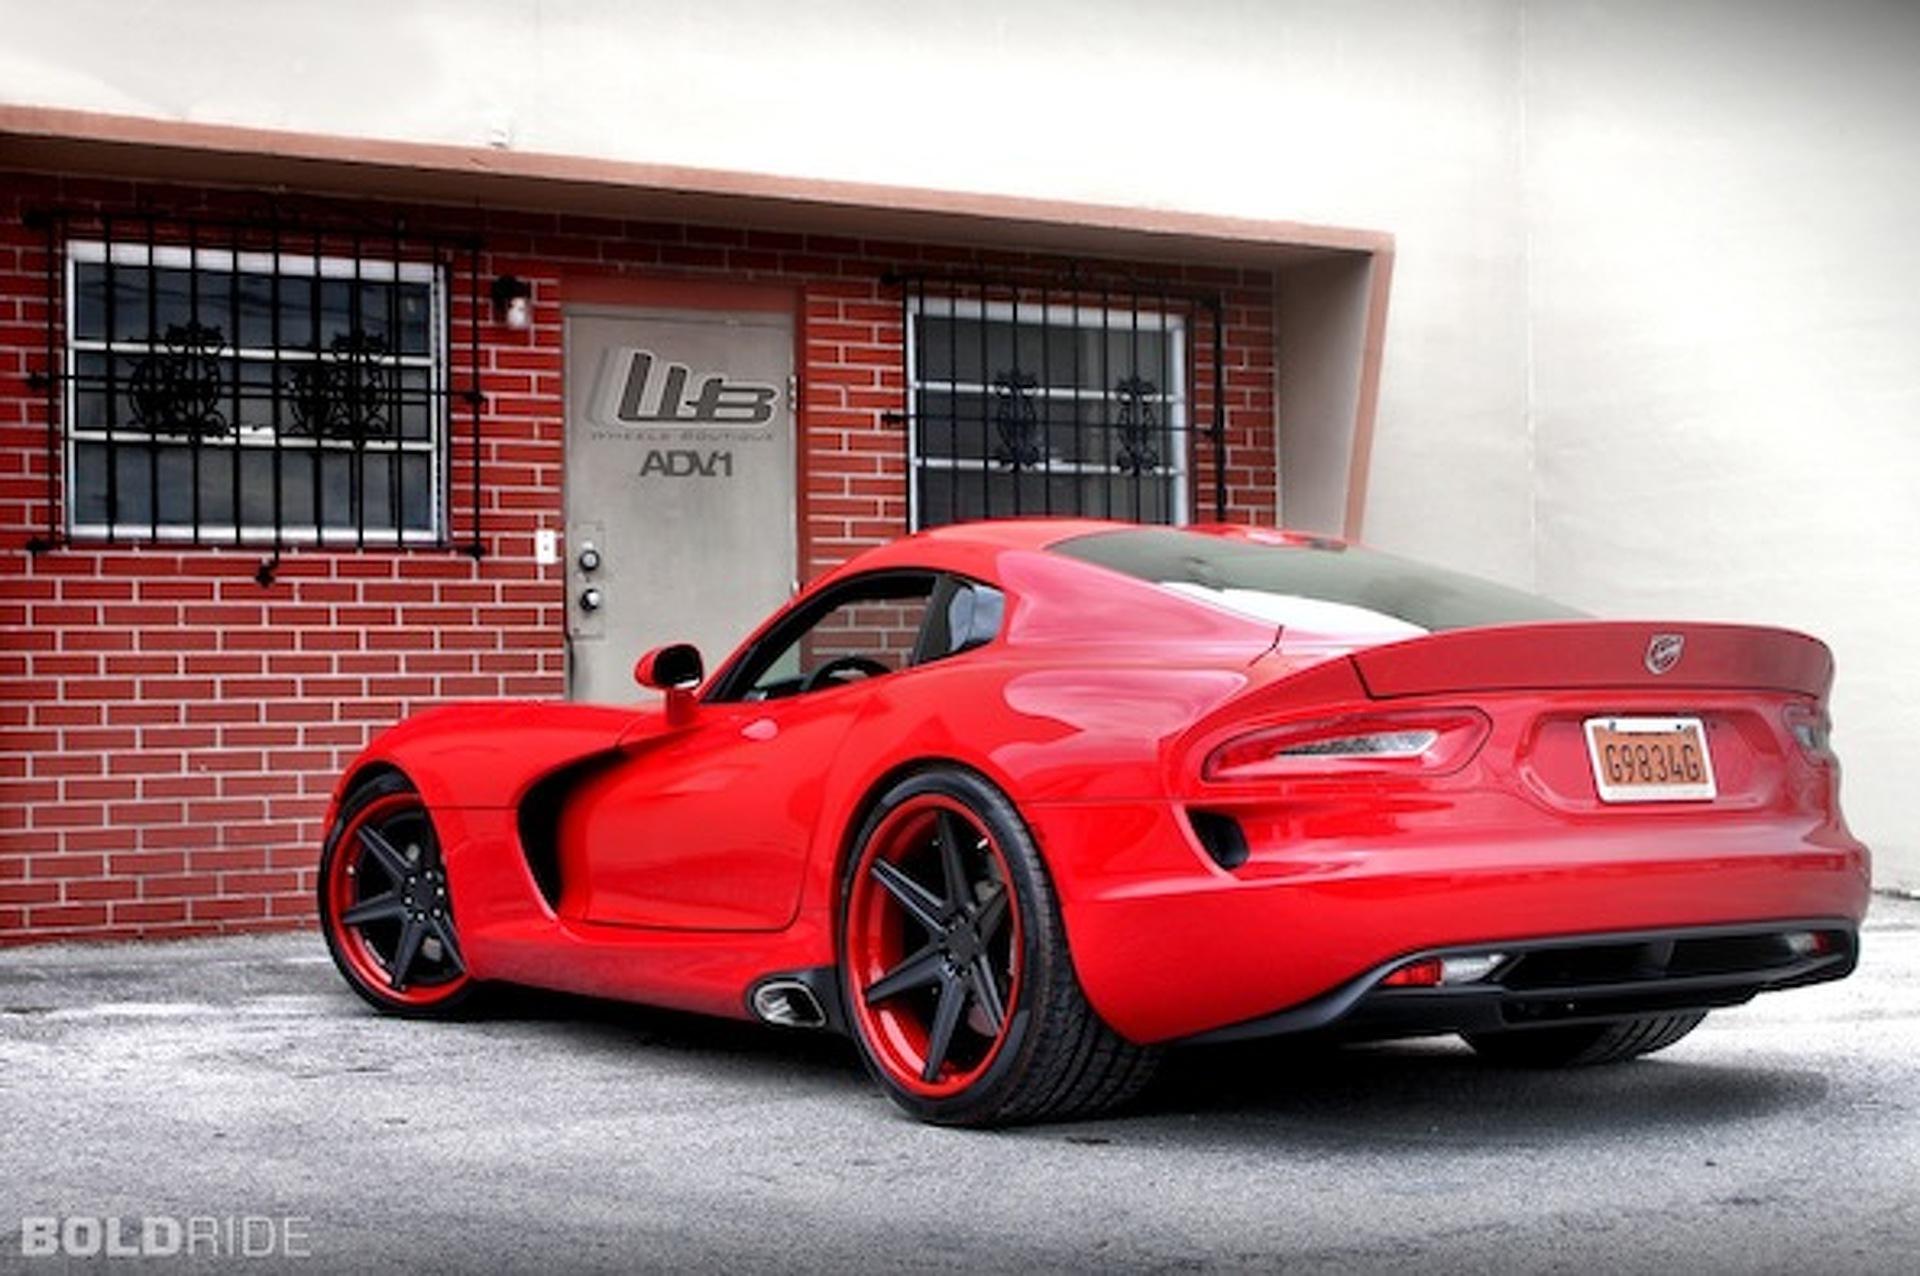 Wheels Boutique Freshens Up the SRT Viper